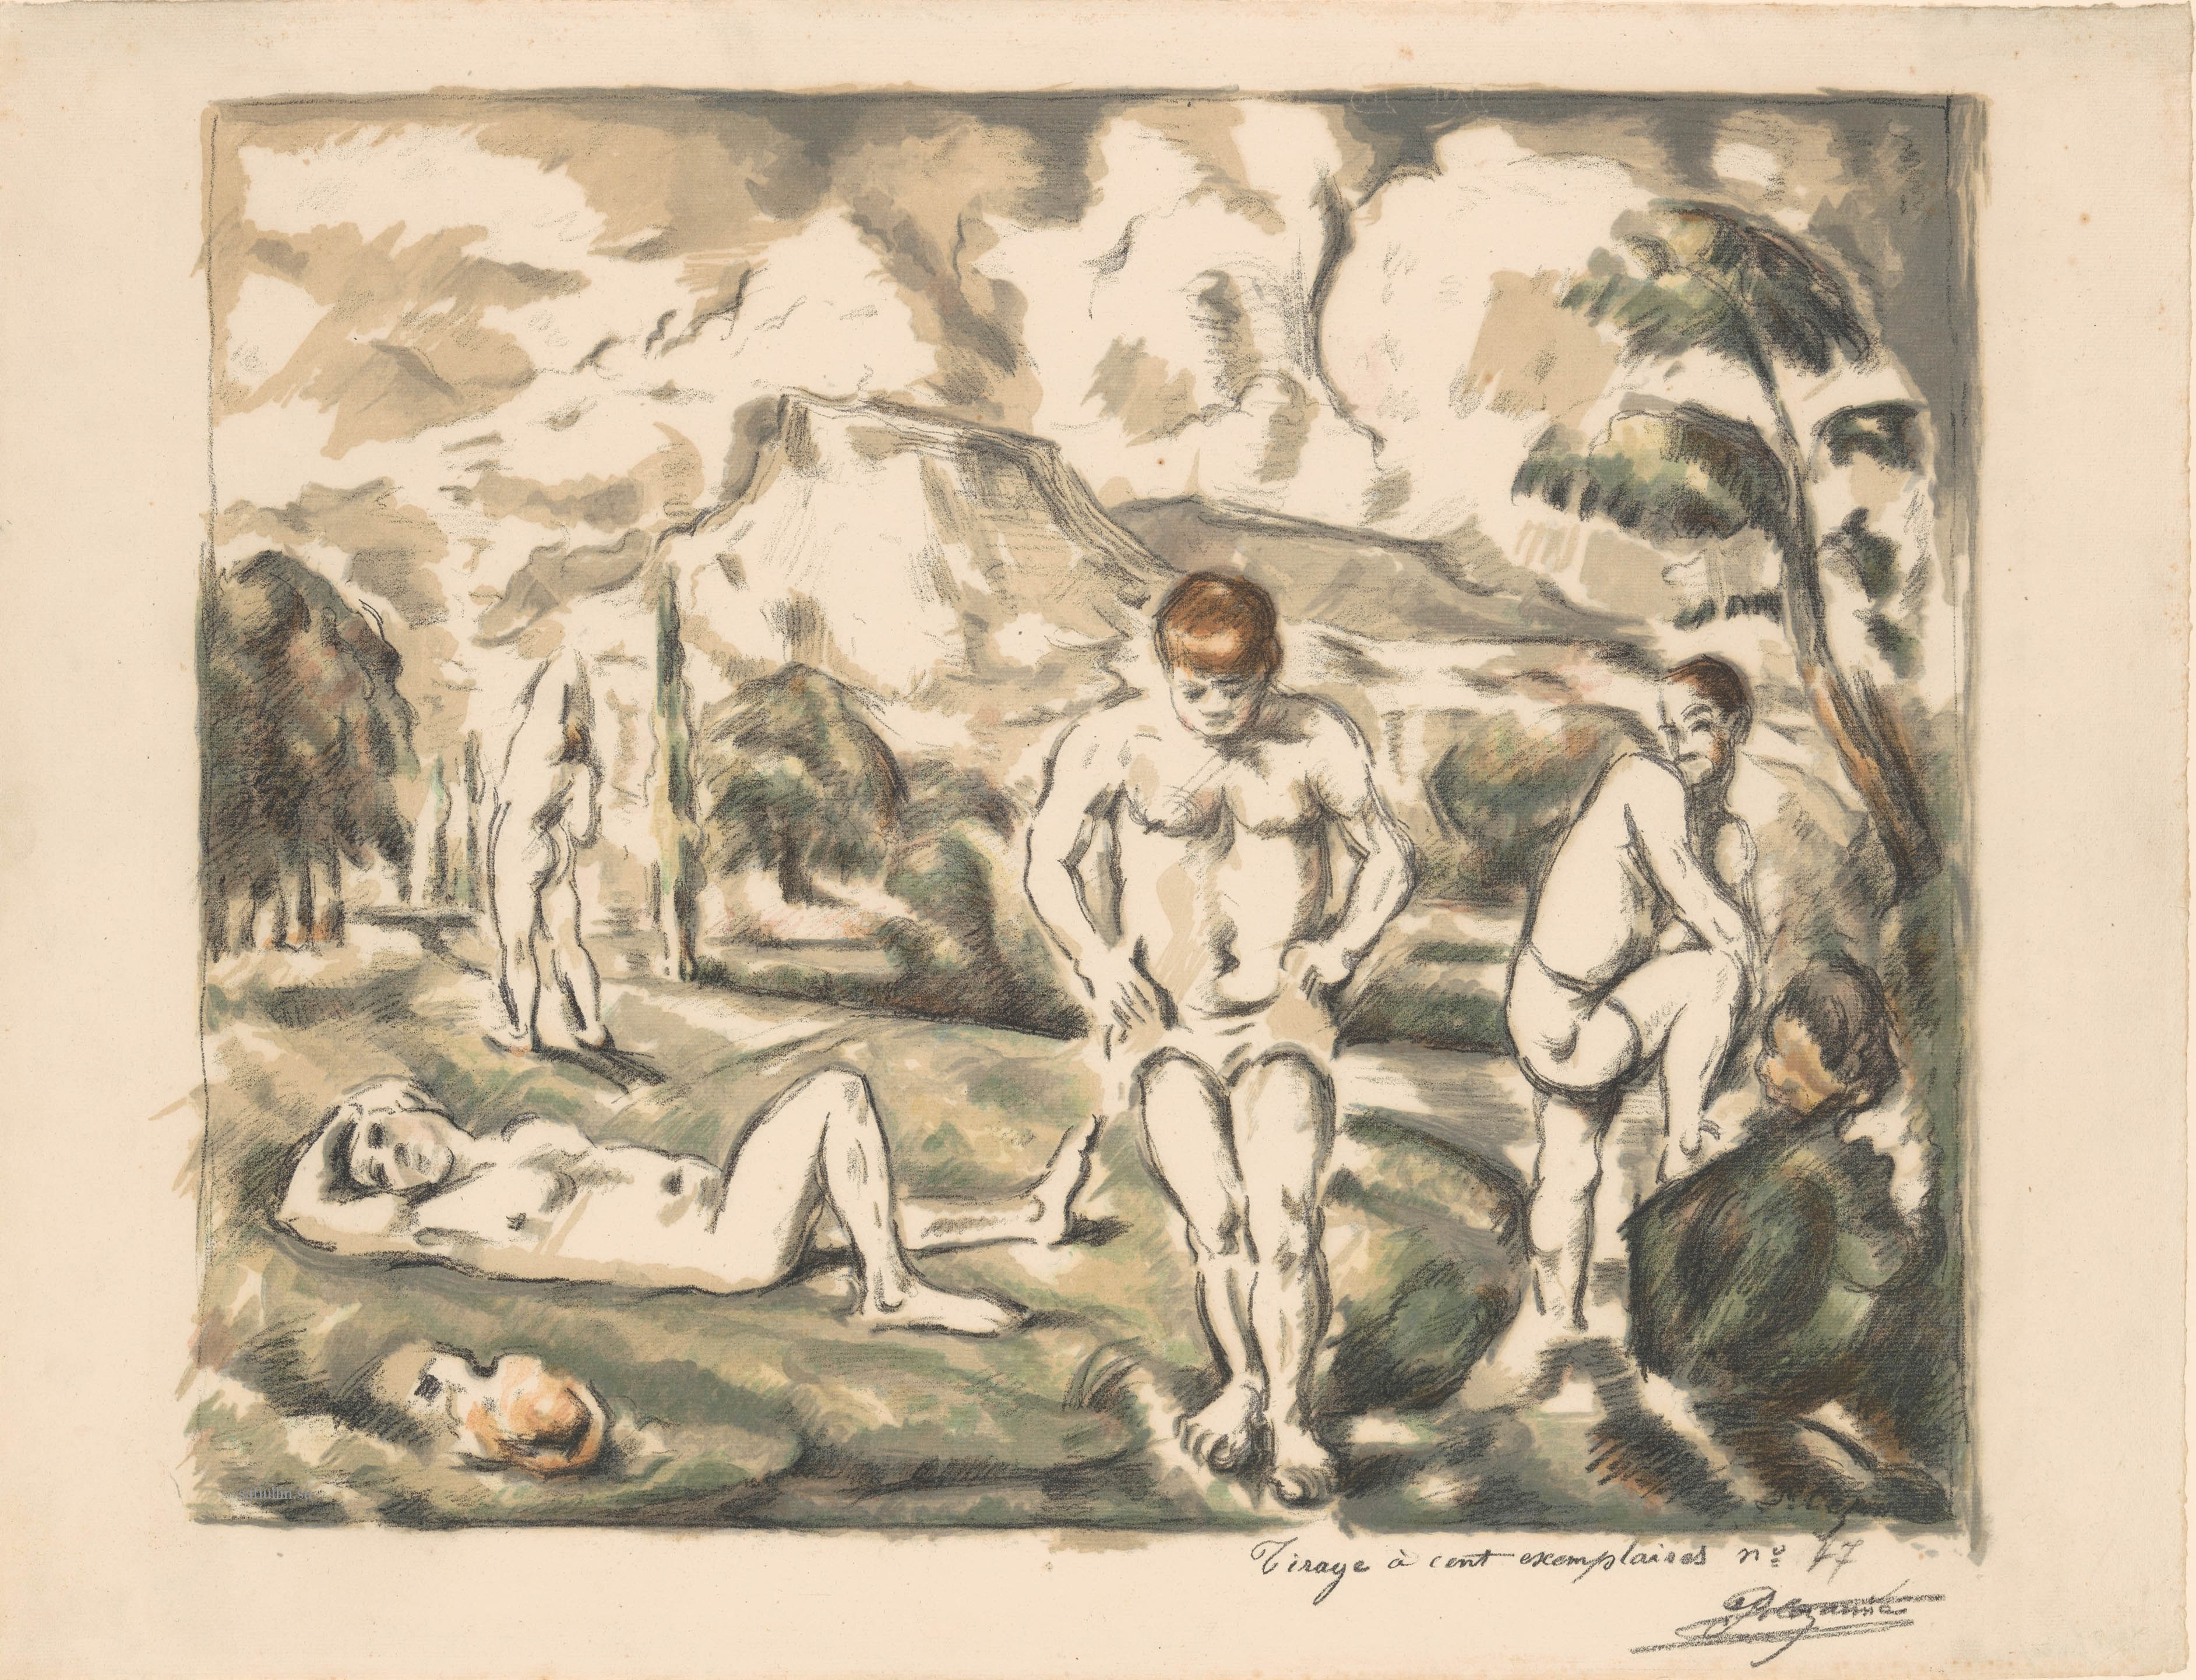 Сезанн рисунок The Large Bathers (Les Baigneurs) пейзажи природы Сафиуллин литография 1898